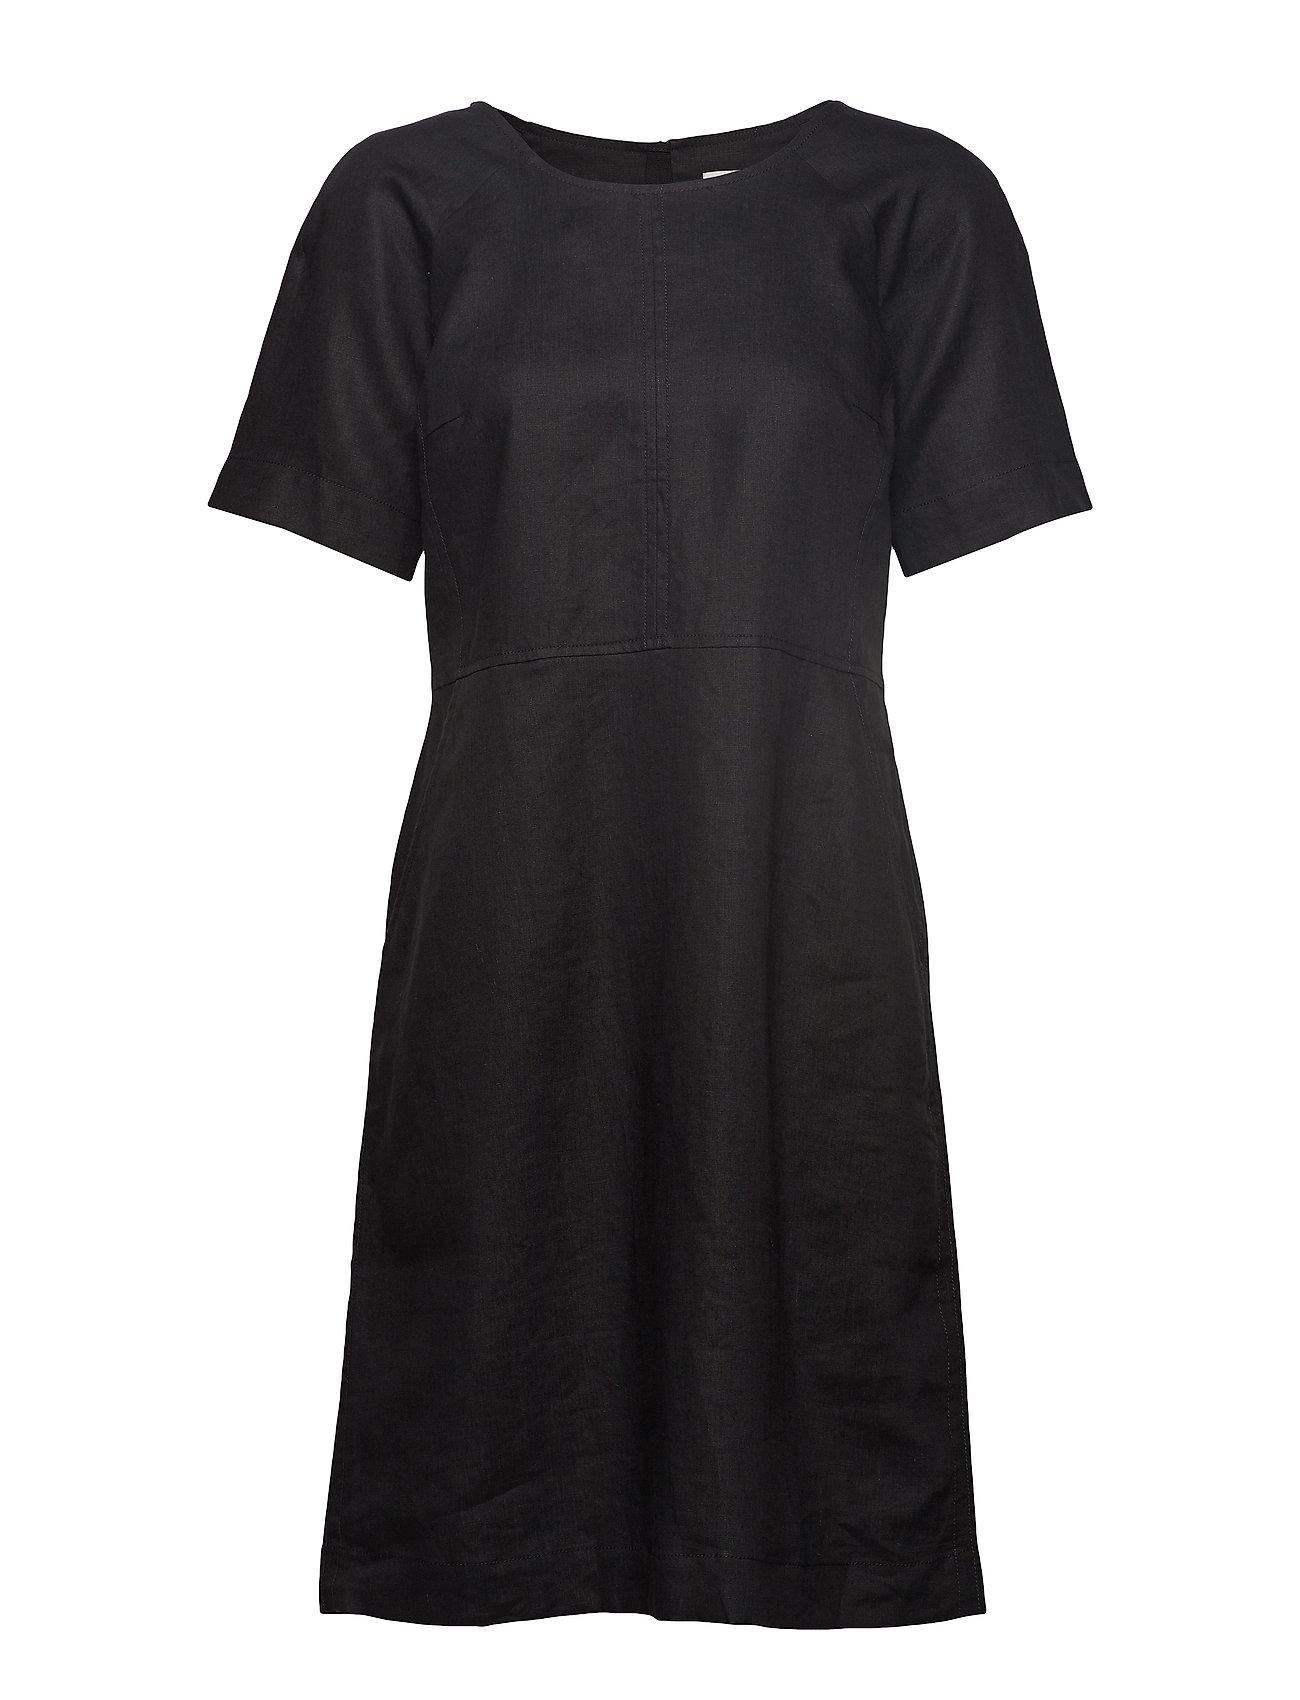 SleeveblackNoa Short Short Dress Dress SleeveblackNoa Short Short Short SleeveblackNoa SleeveblackNoa Dress SleeveblackNoa Dress Dress Dress MUVpqzS